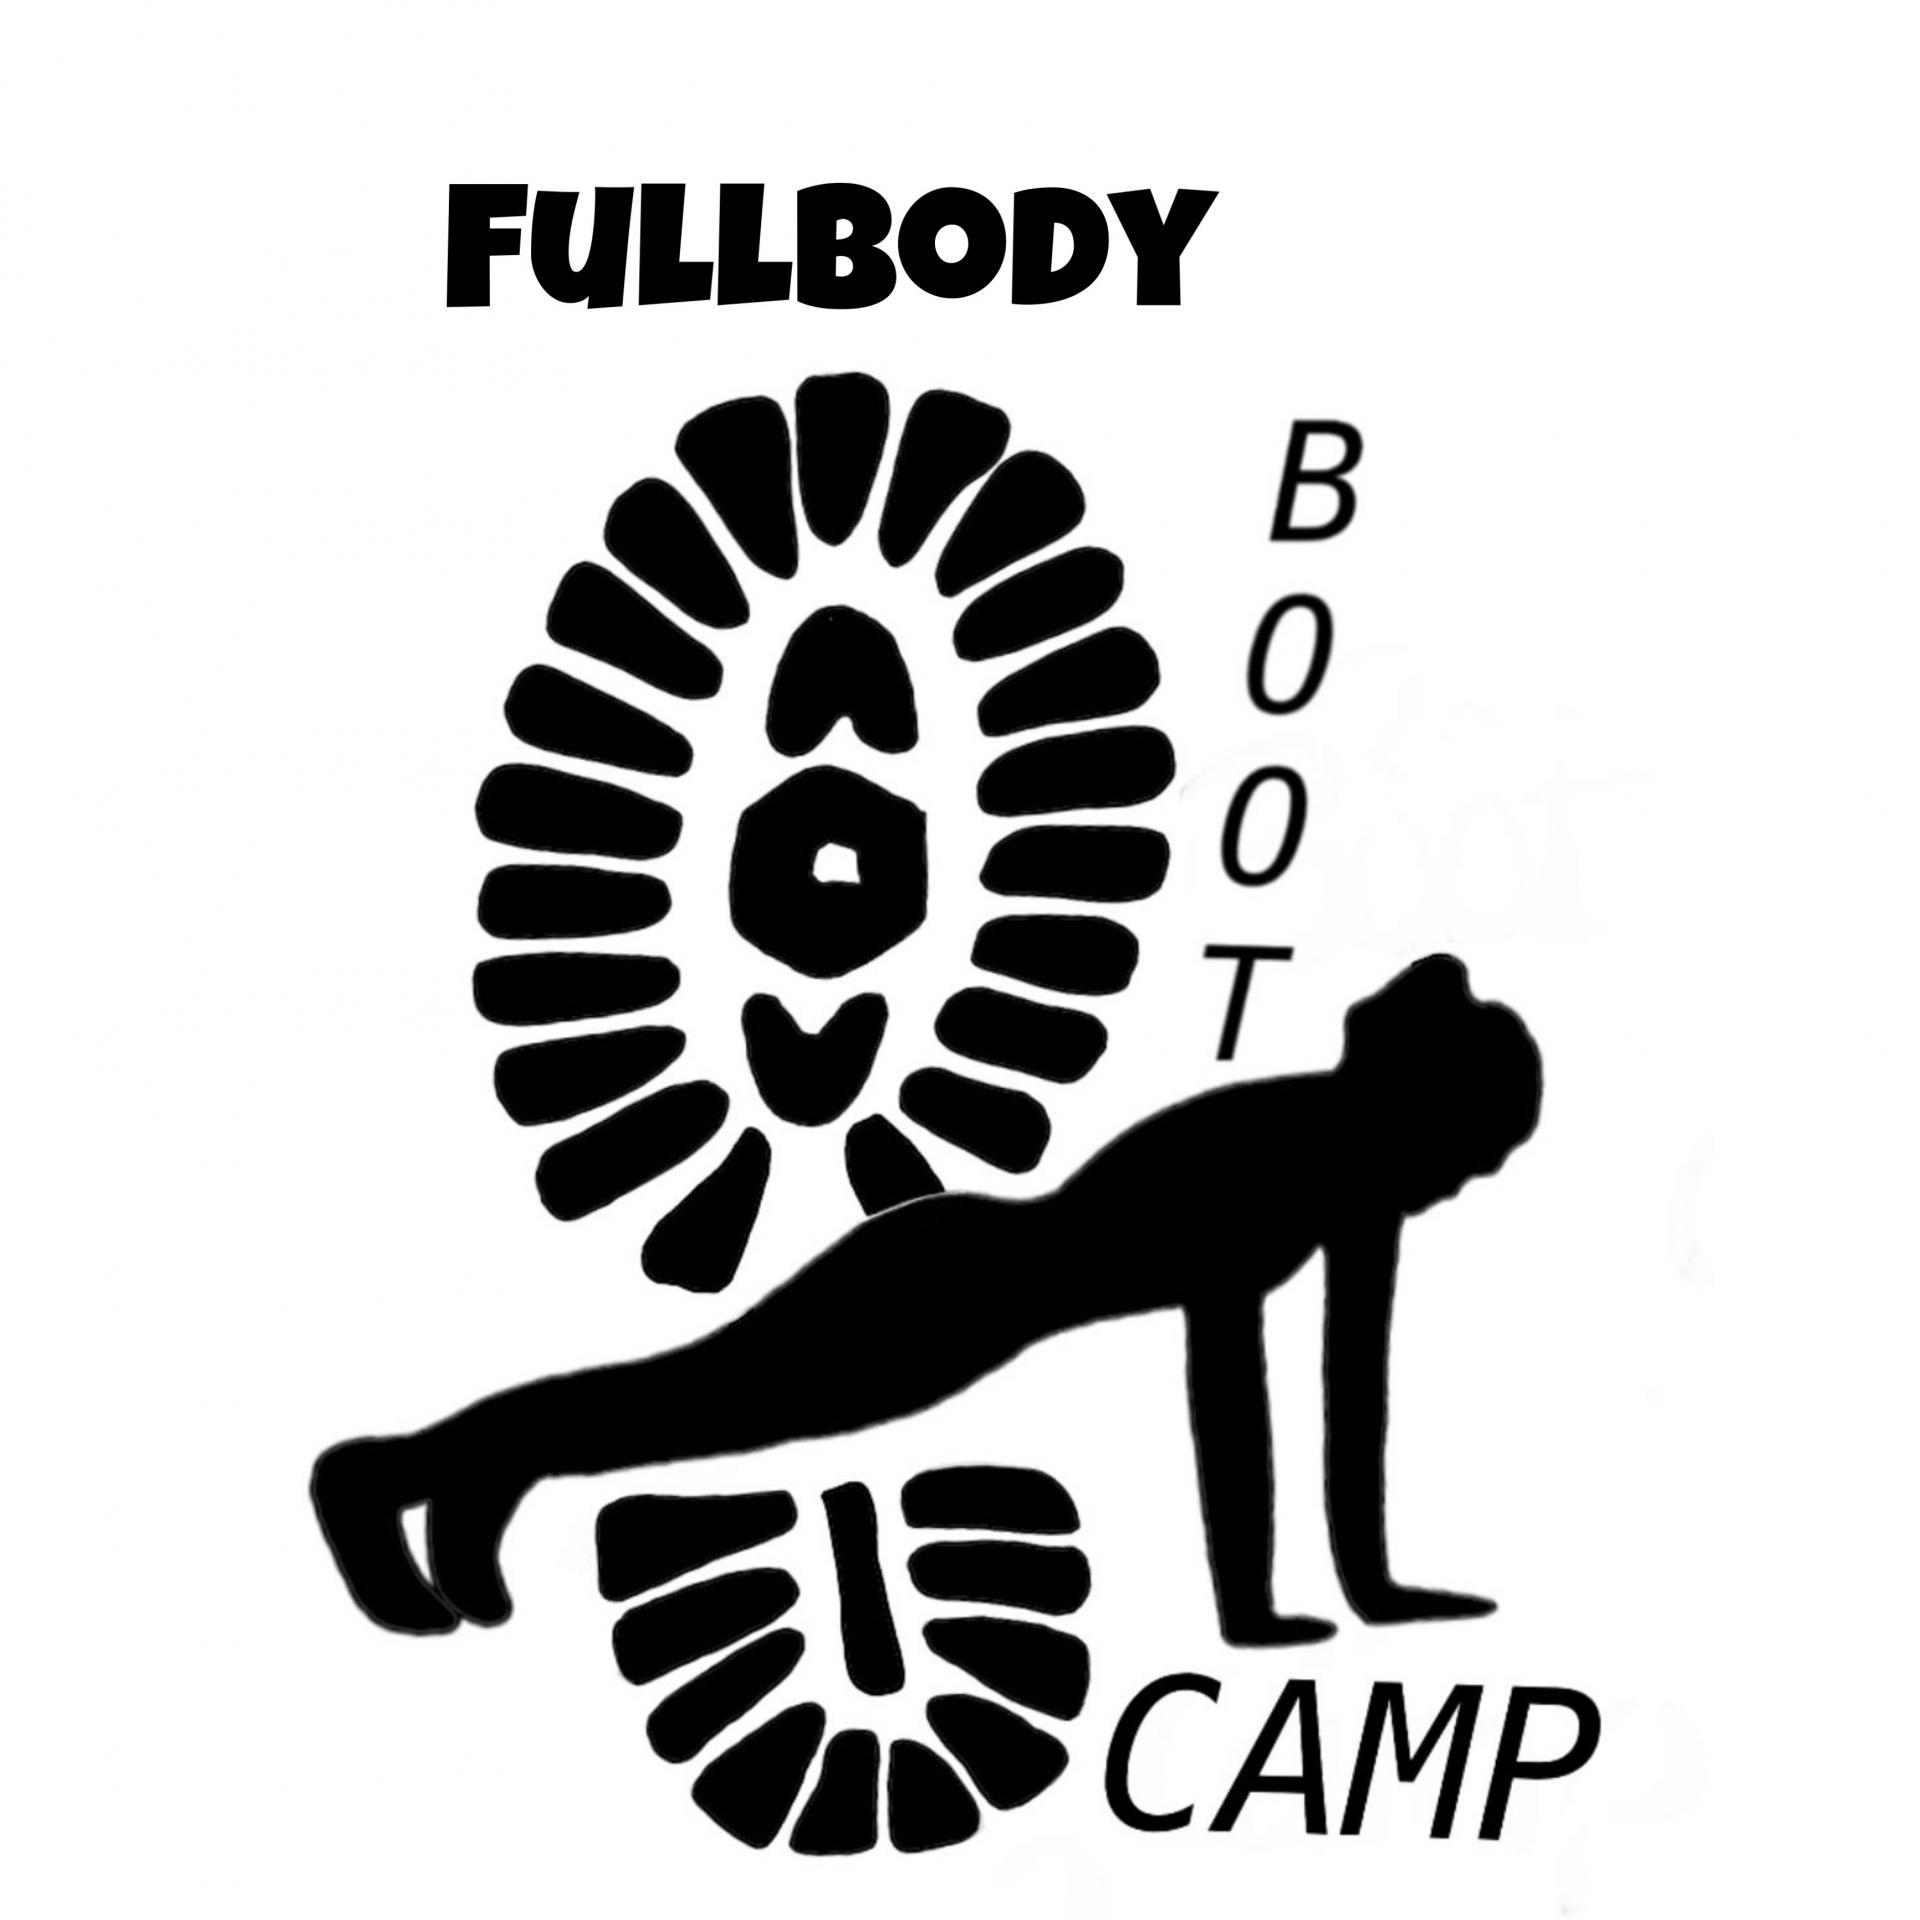 Fullbody Bootcamp